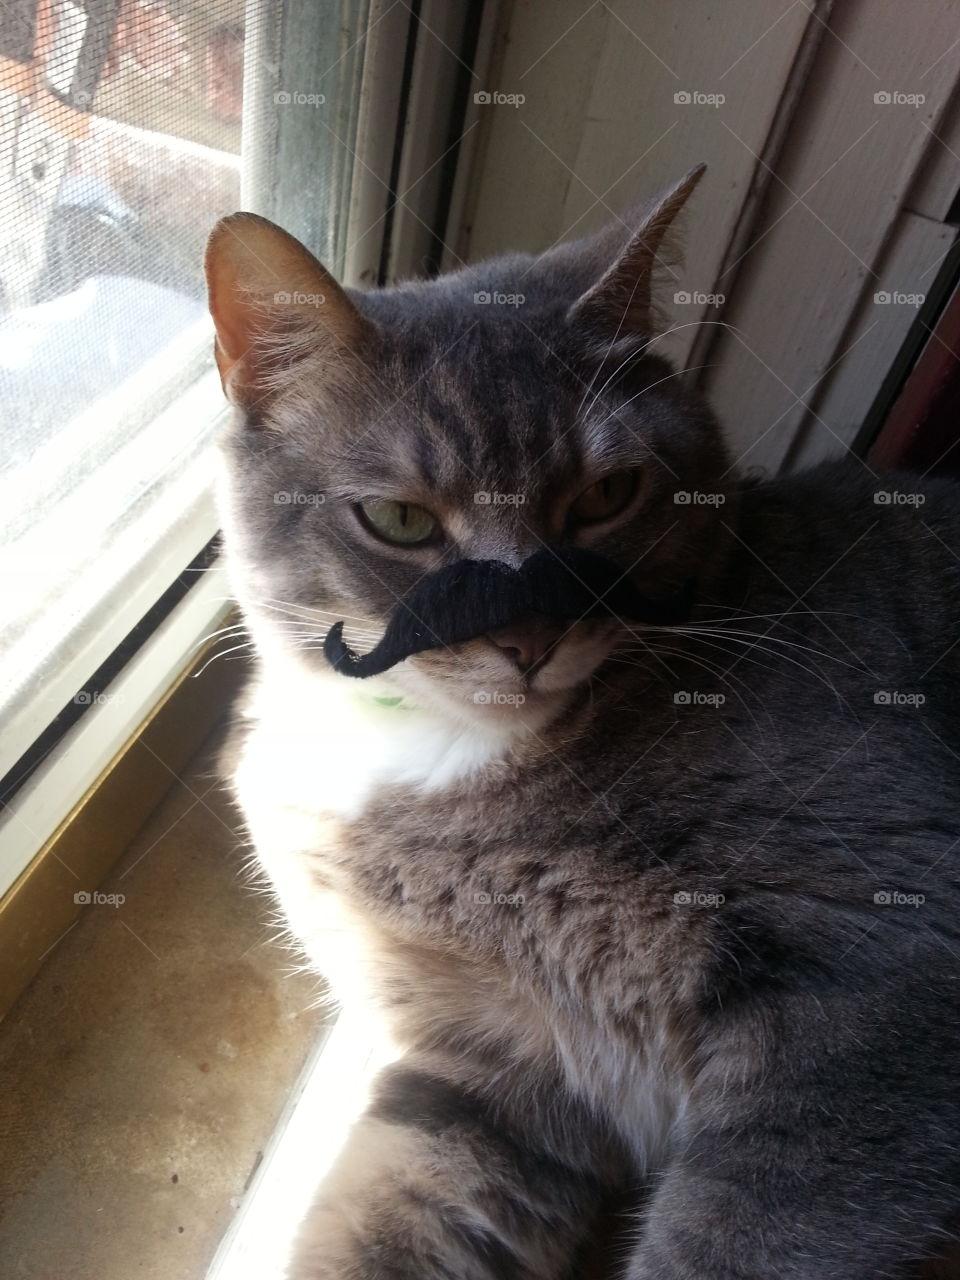 Stache Cat